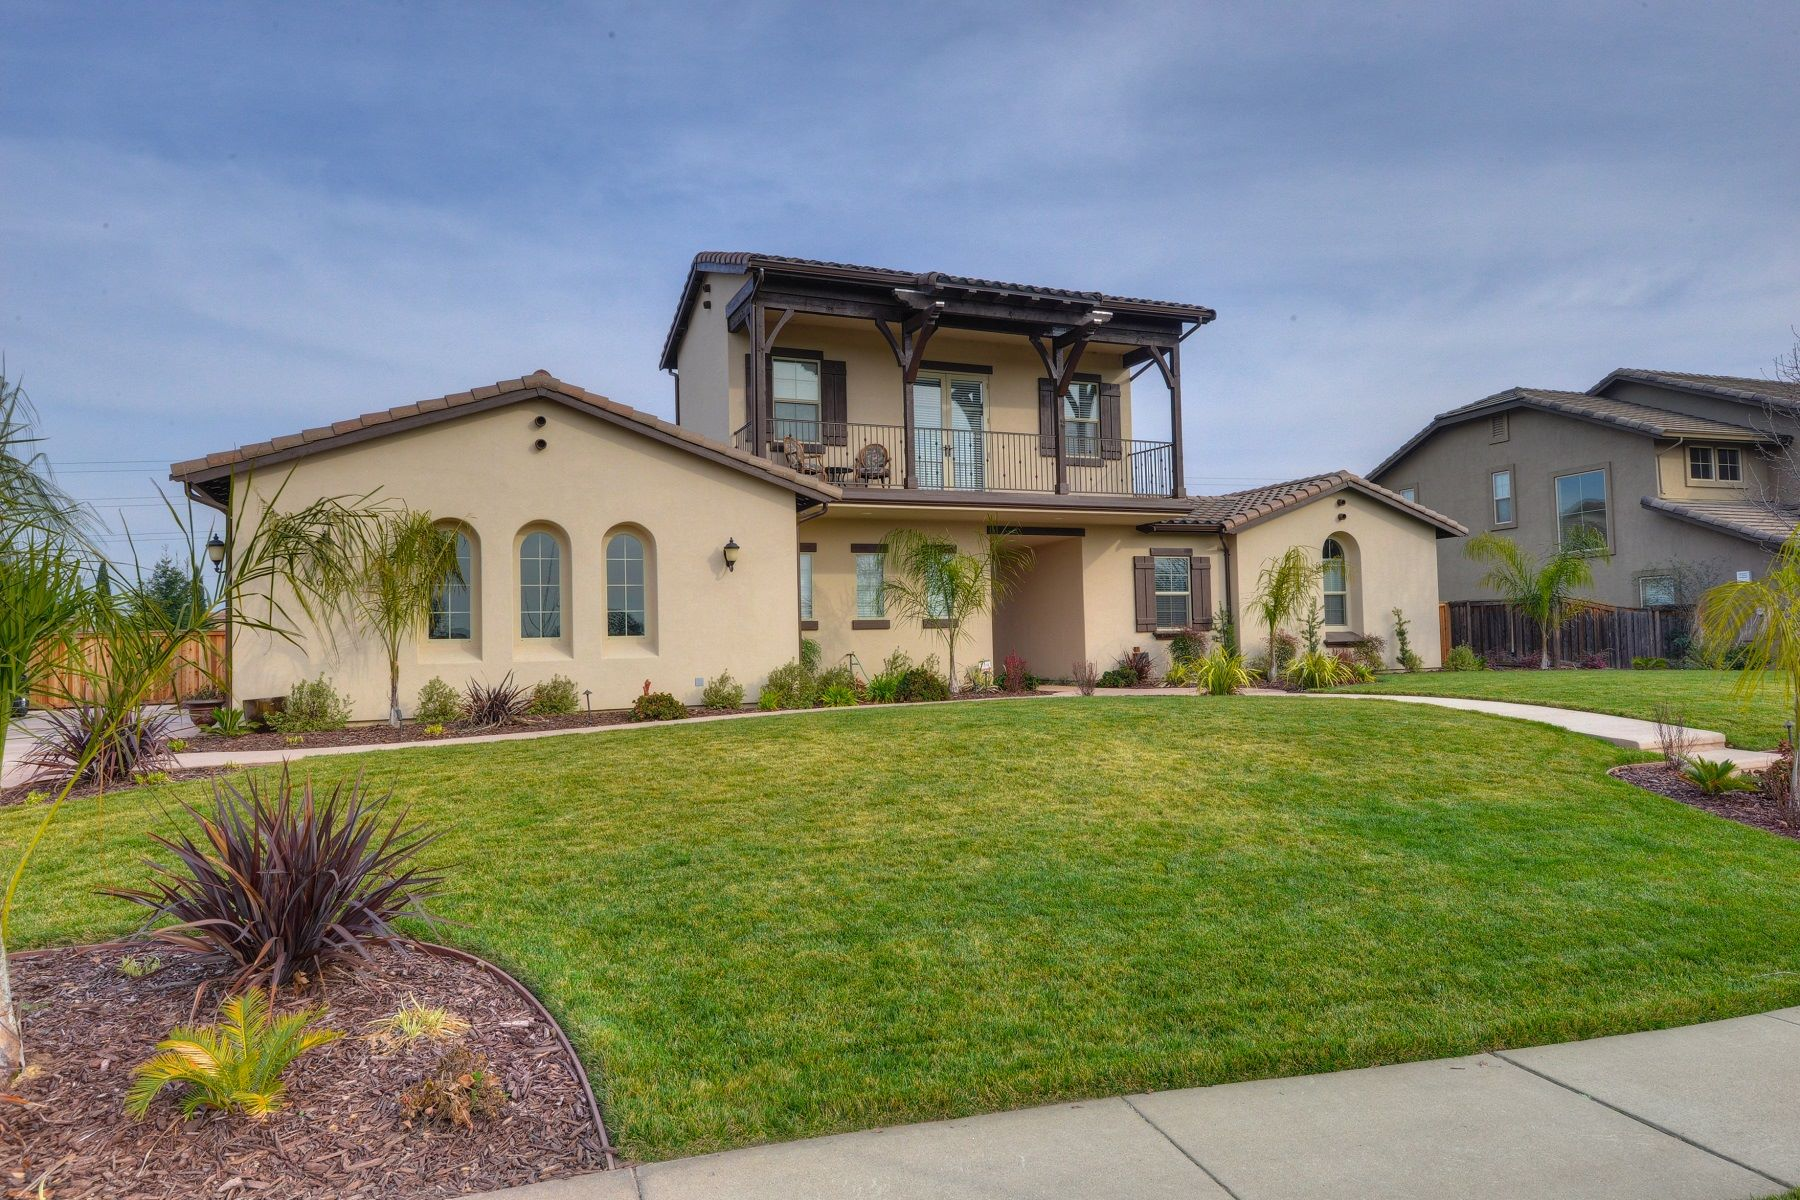 Single Family Home for Sale at 8635 Morgan Creek Lane, Roseville, CA 95747 Roseville, California 95747 United States